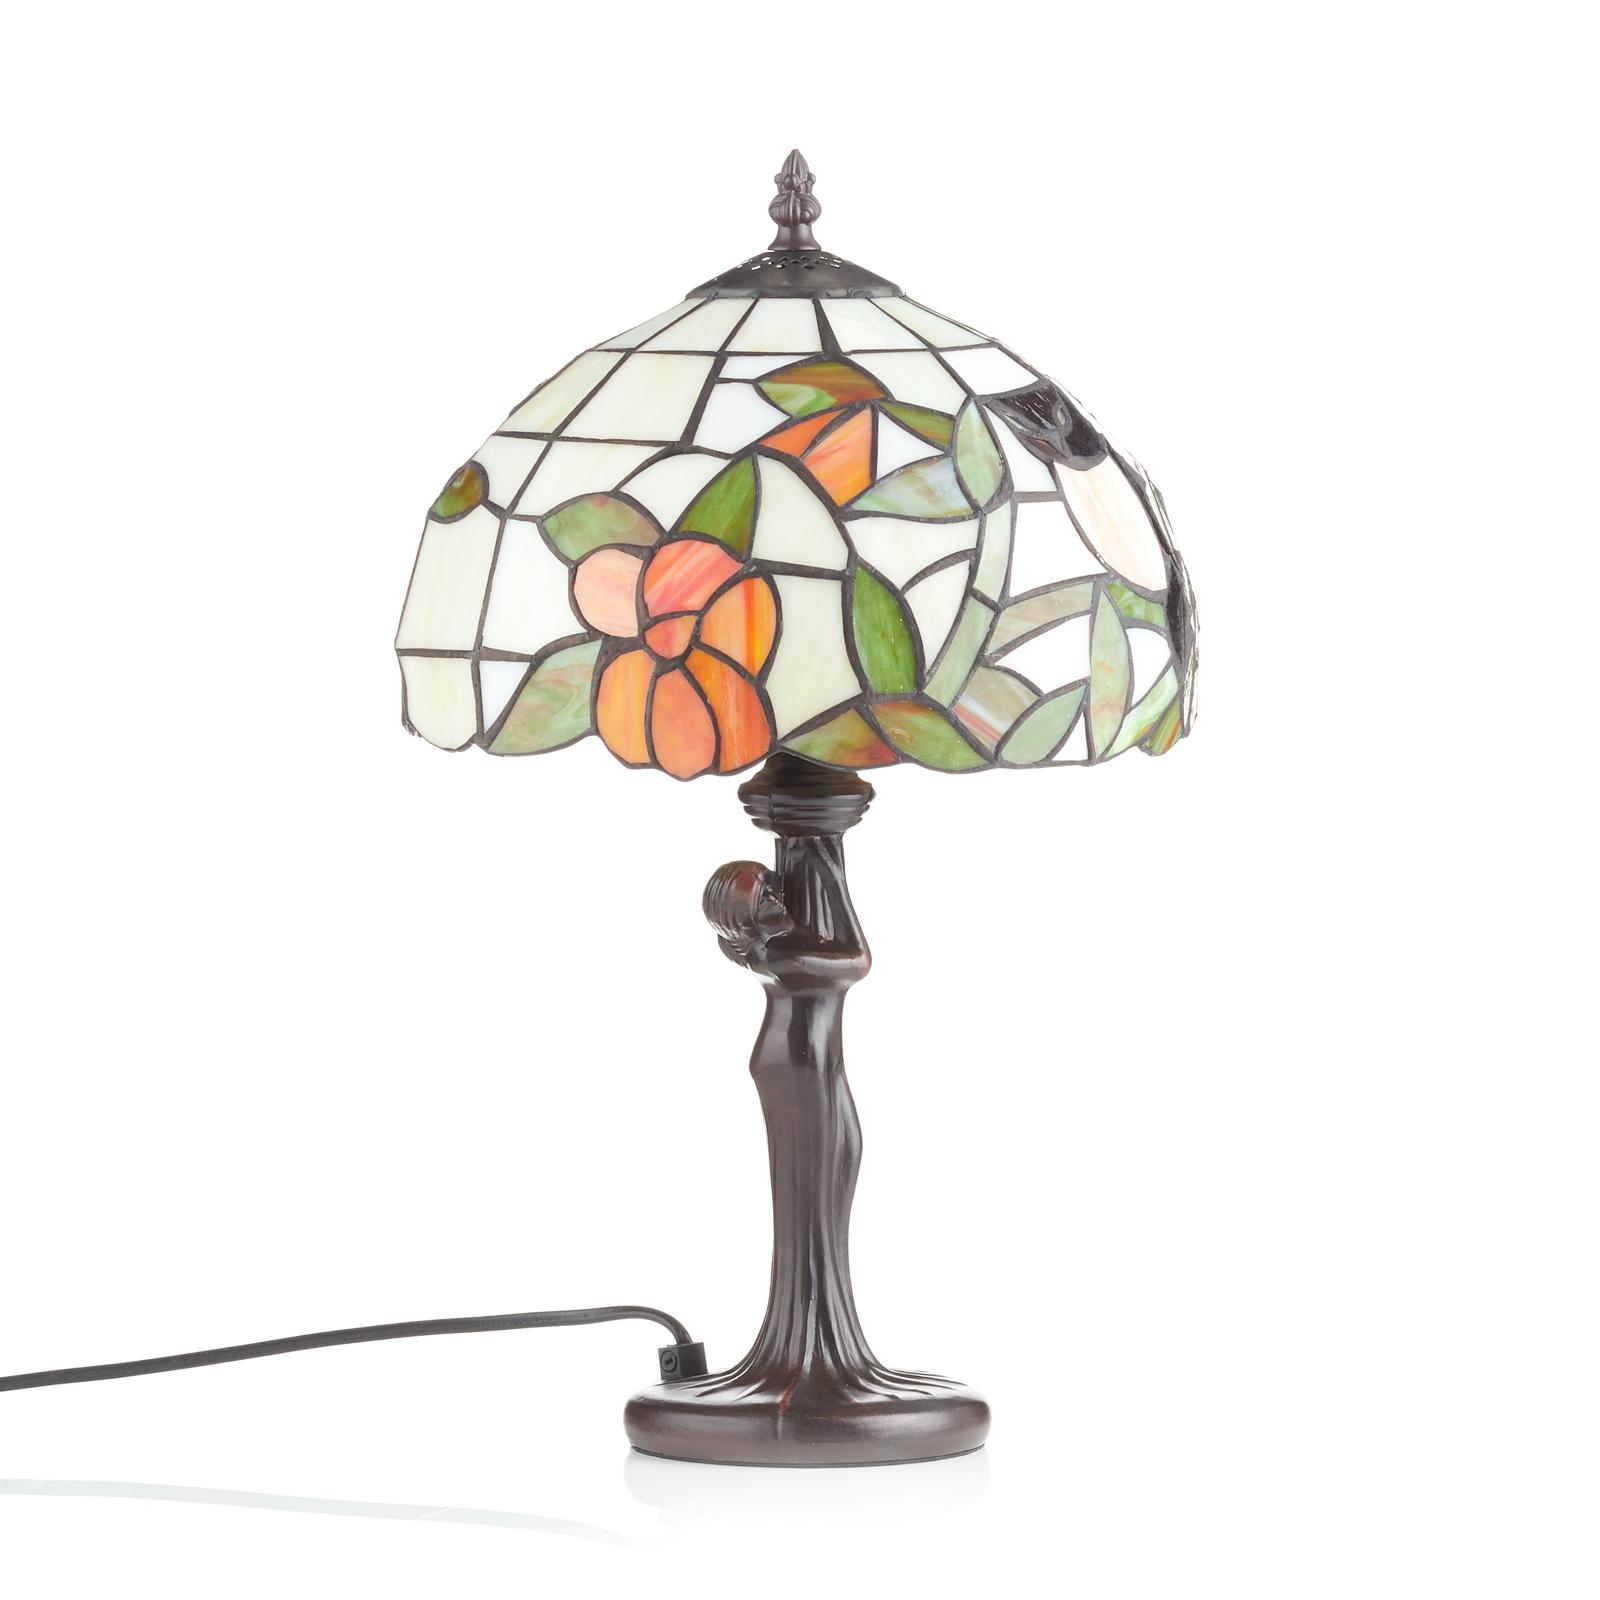 LIEKE - lampada da tavolo in stile Tiffany